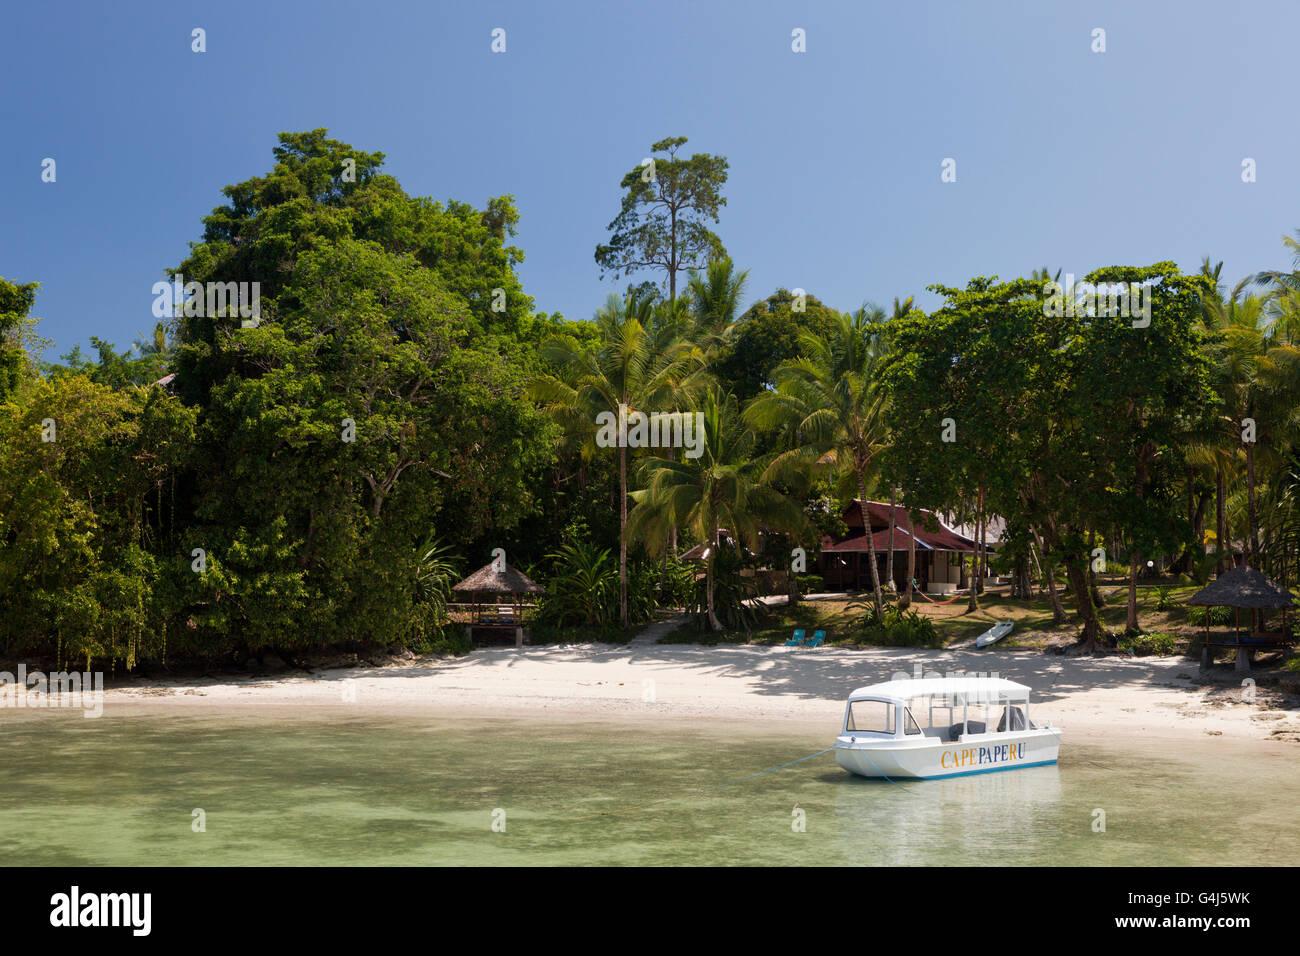 Beach of Capepaperu Resort, Ambon, Moluccas, Indonesia Stock Photo